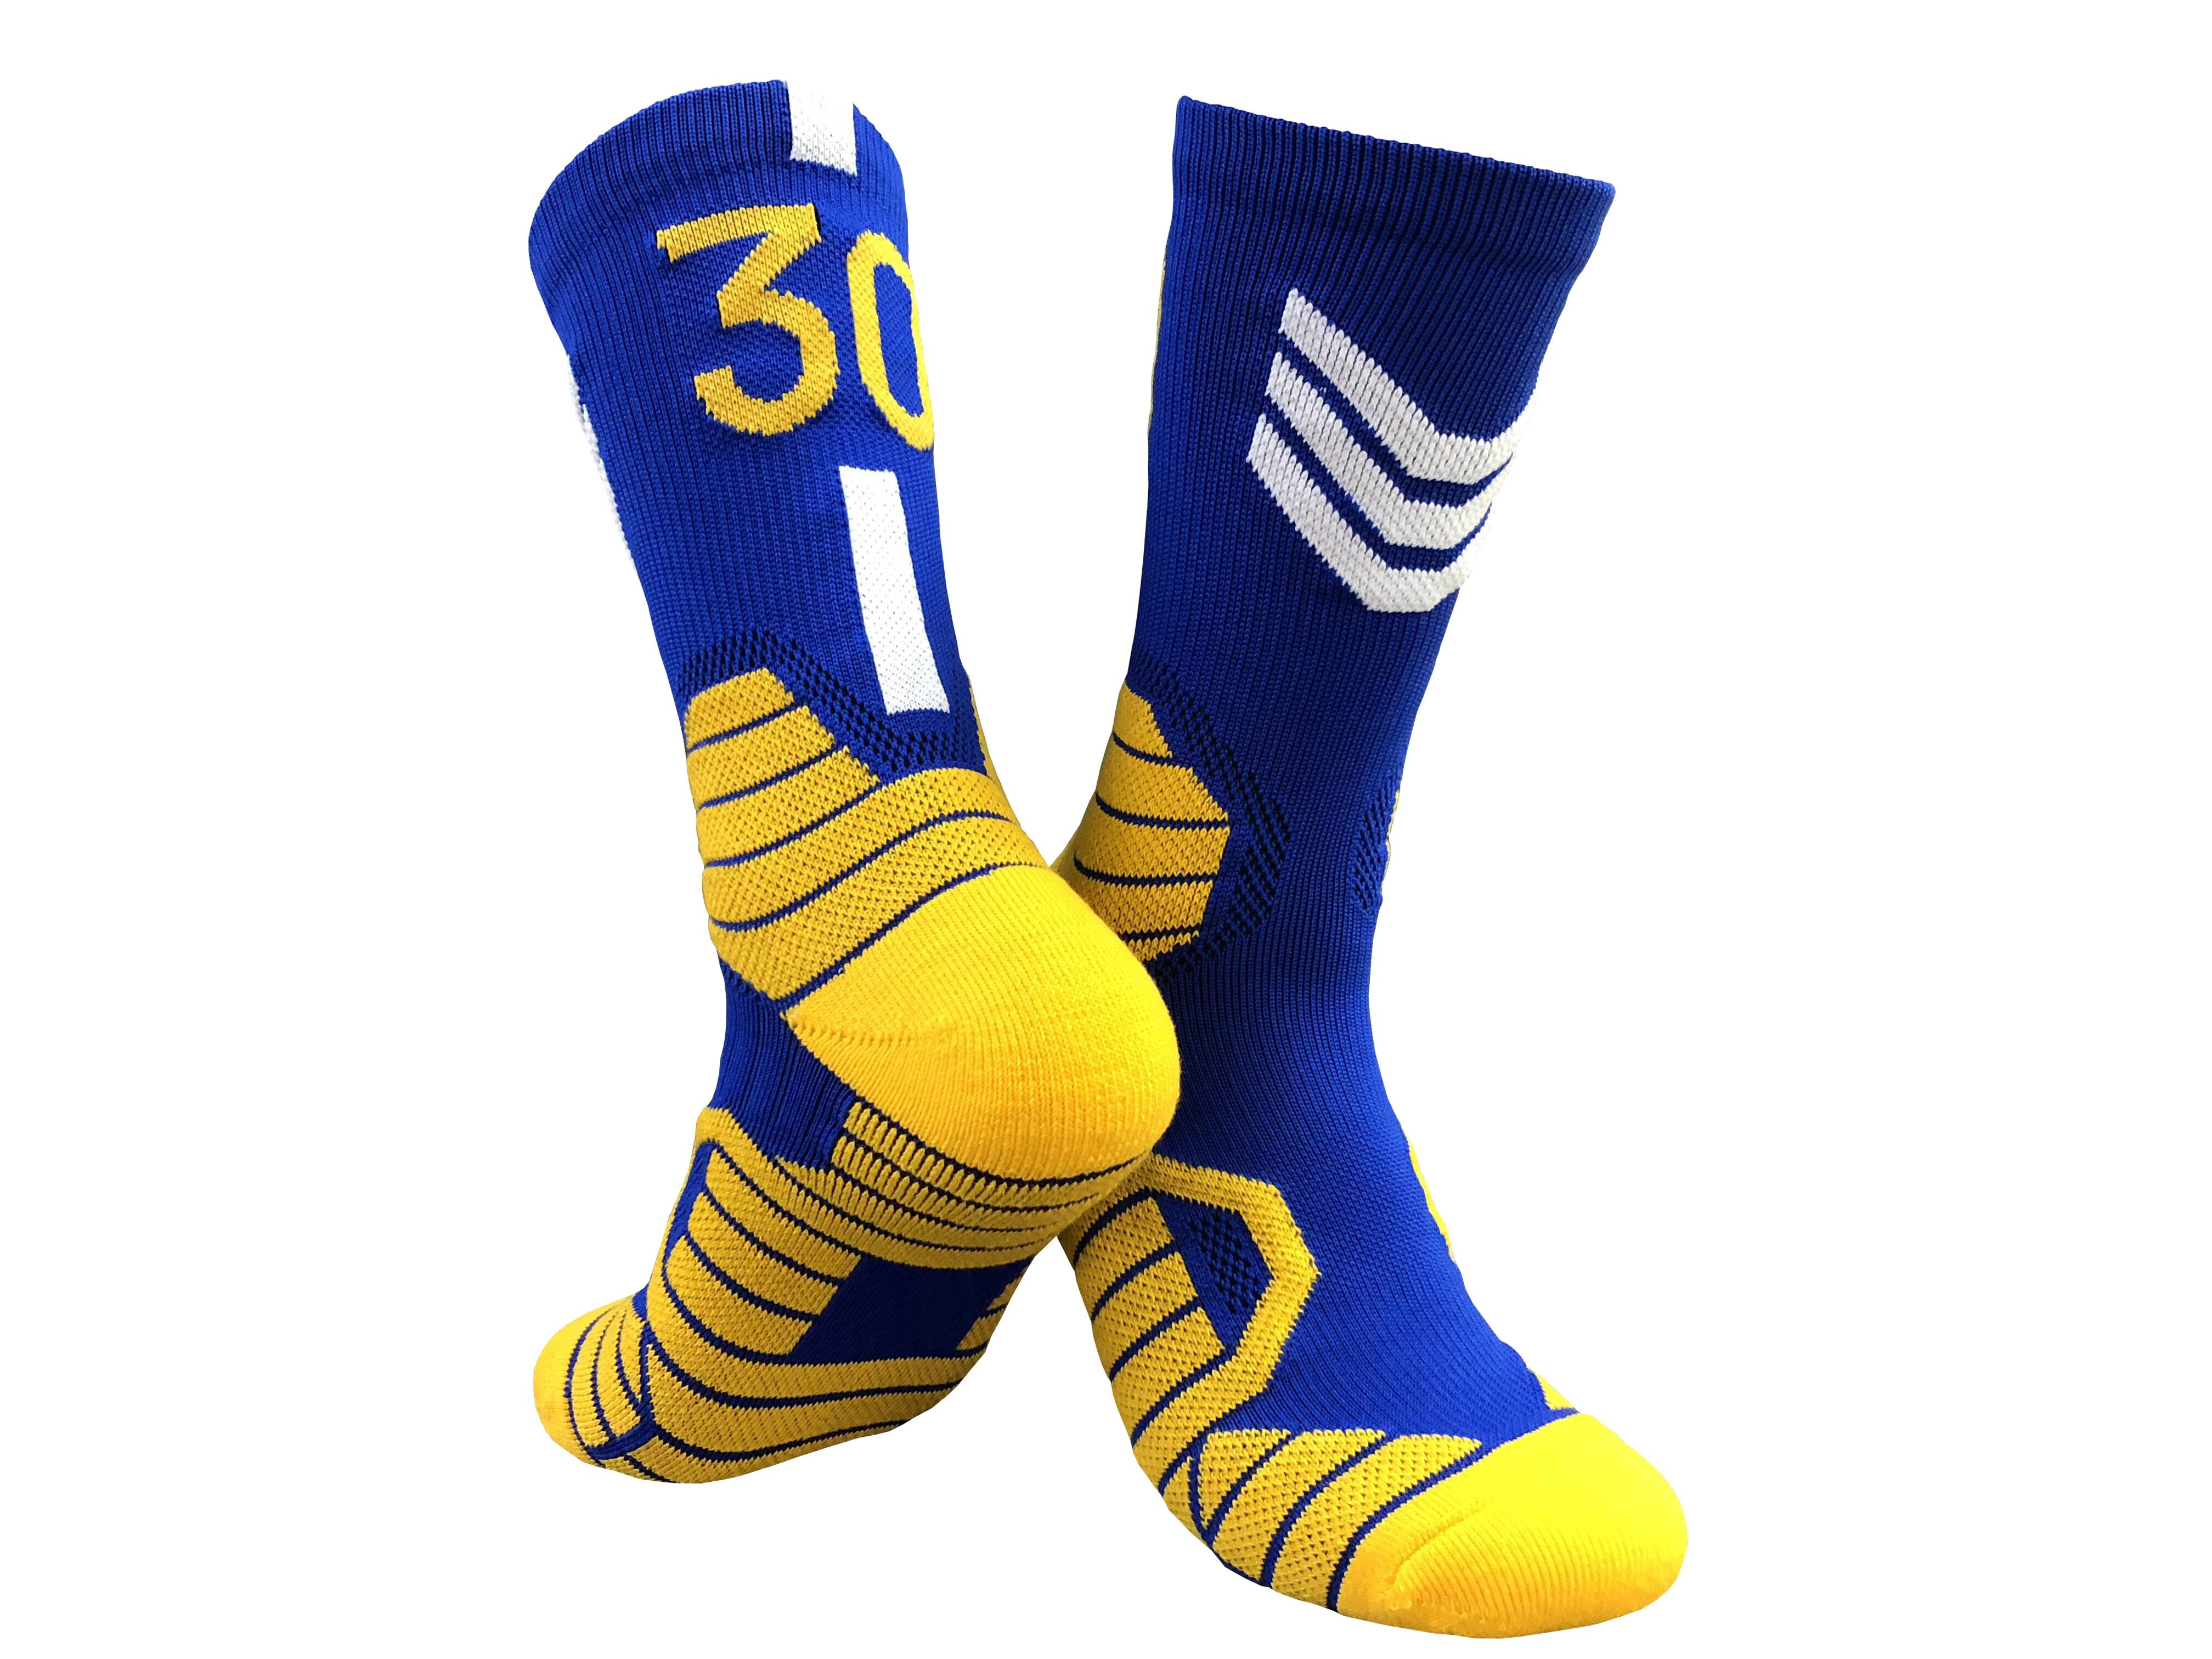 1 pair 30 blue